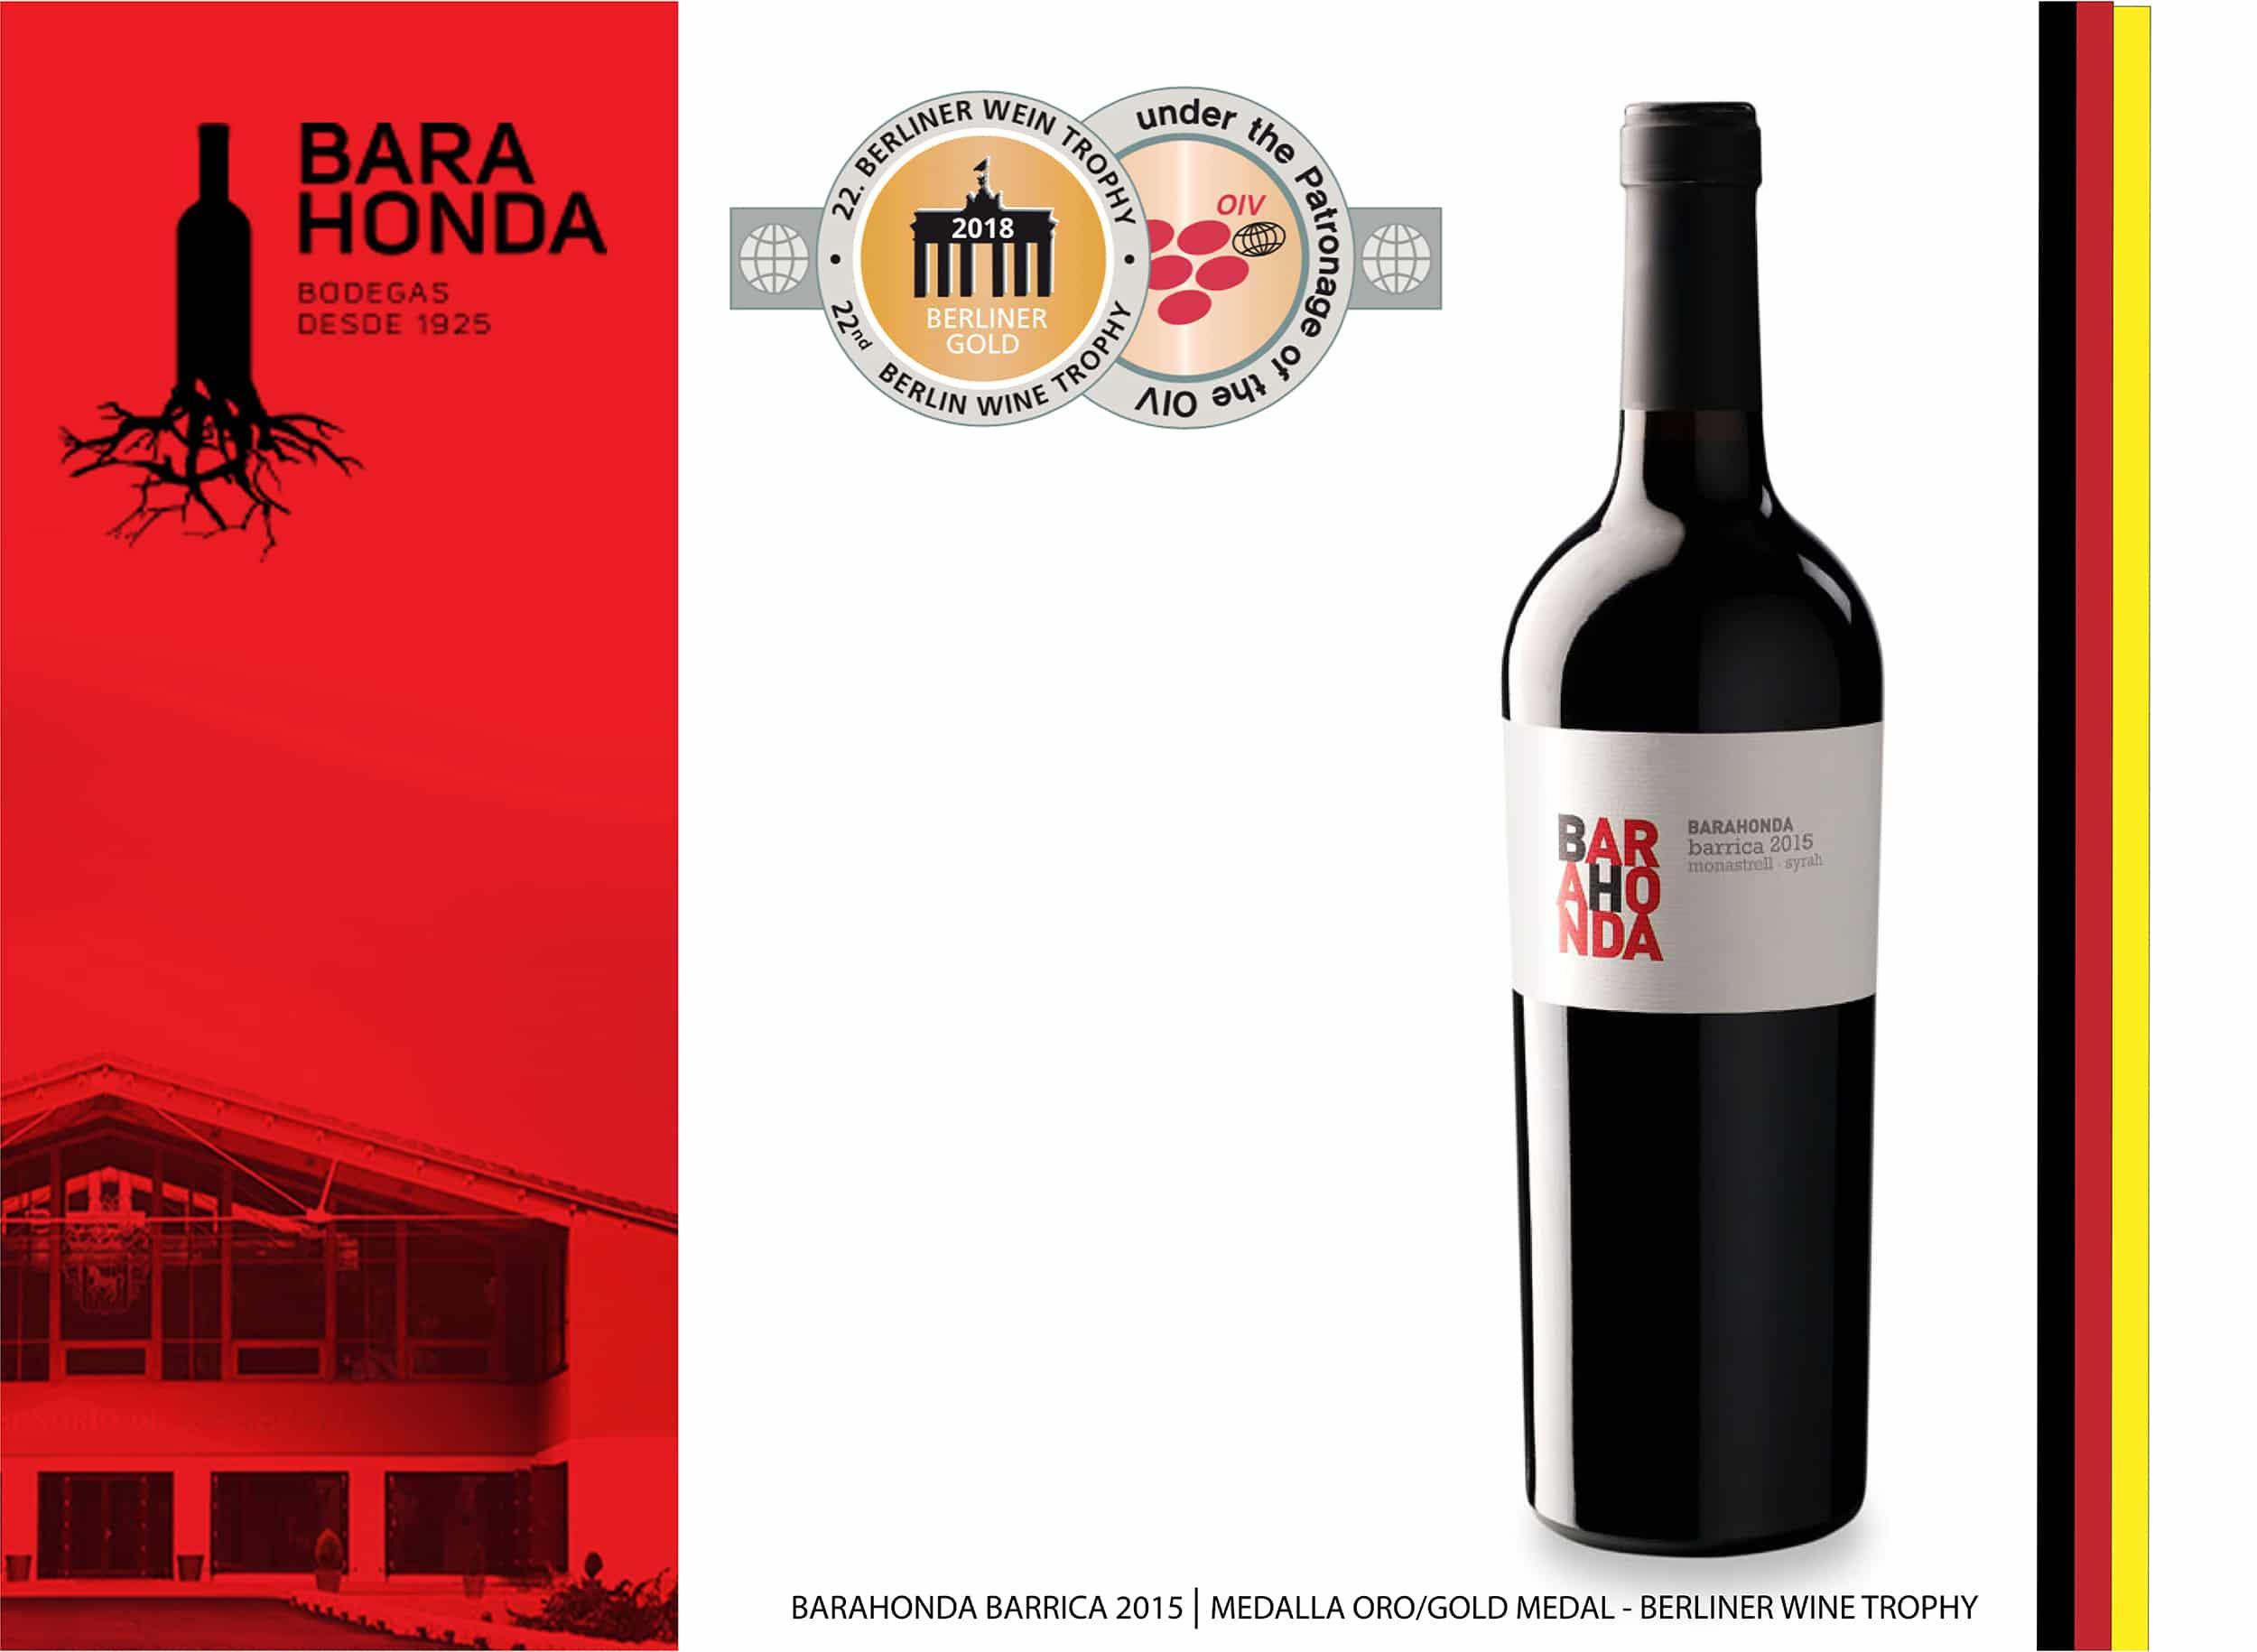 Barahonda Barrica 2015, medalla de oro en Berliner Wein Trophy 2018